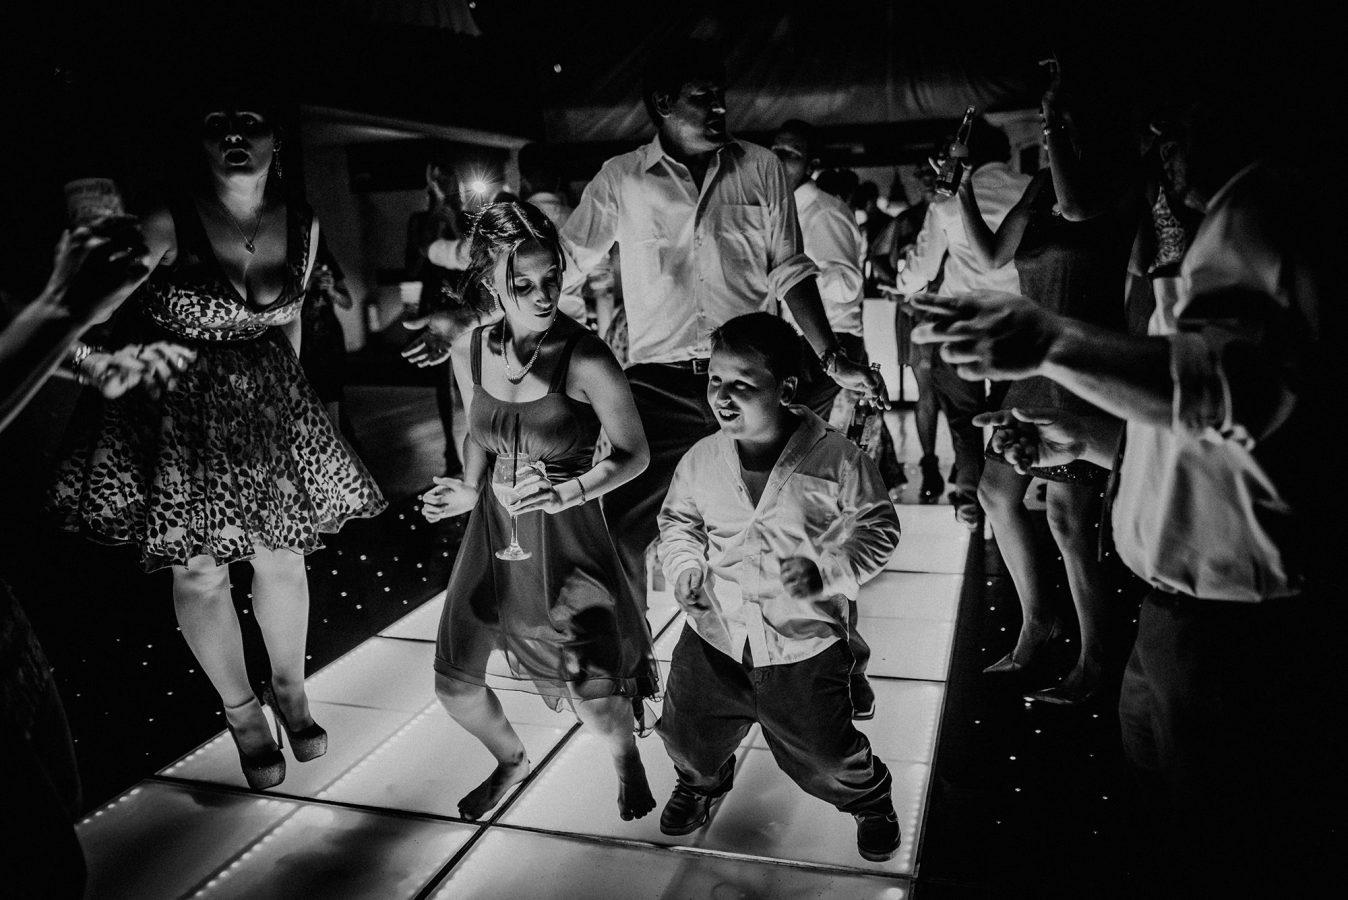 fotografos-de-boda-uruguay-915